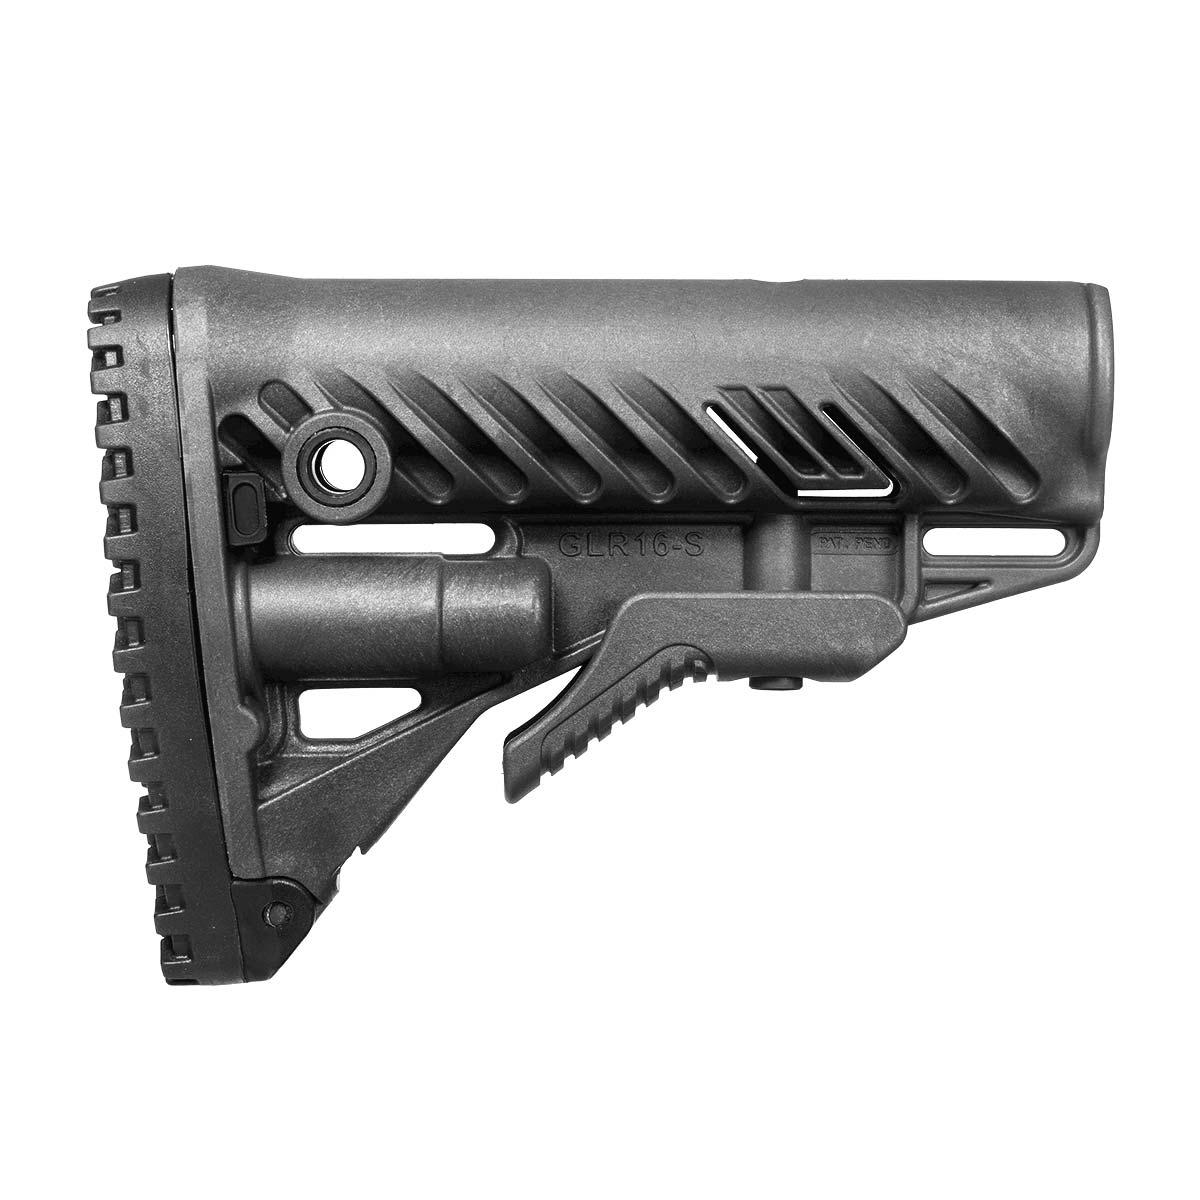 fab-defense-ar15-butt-stock-glr-16-1